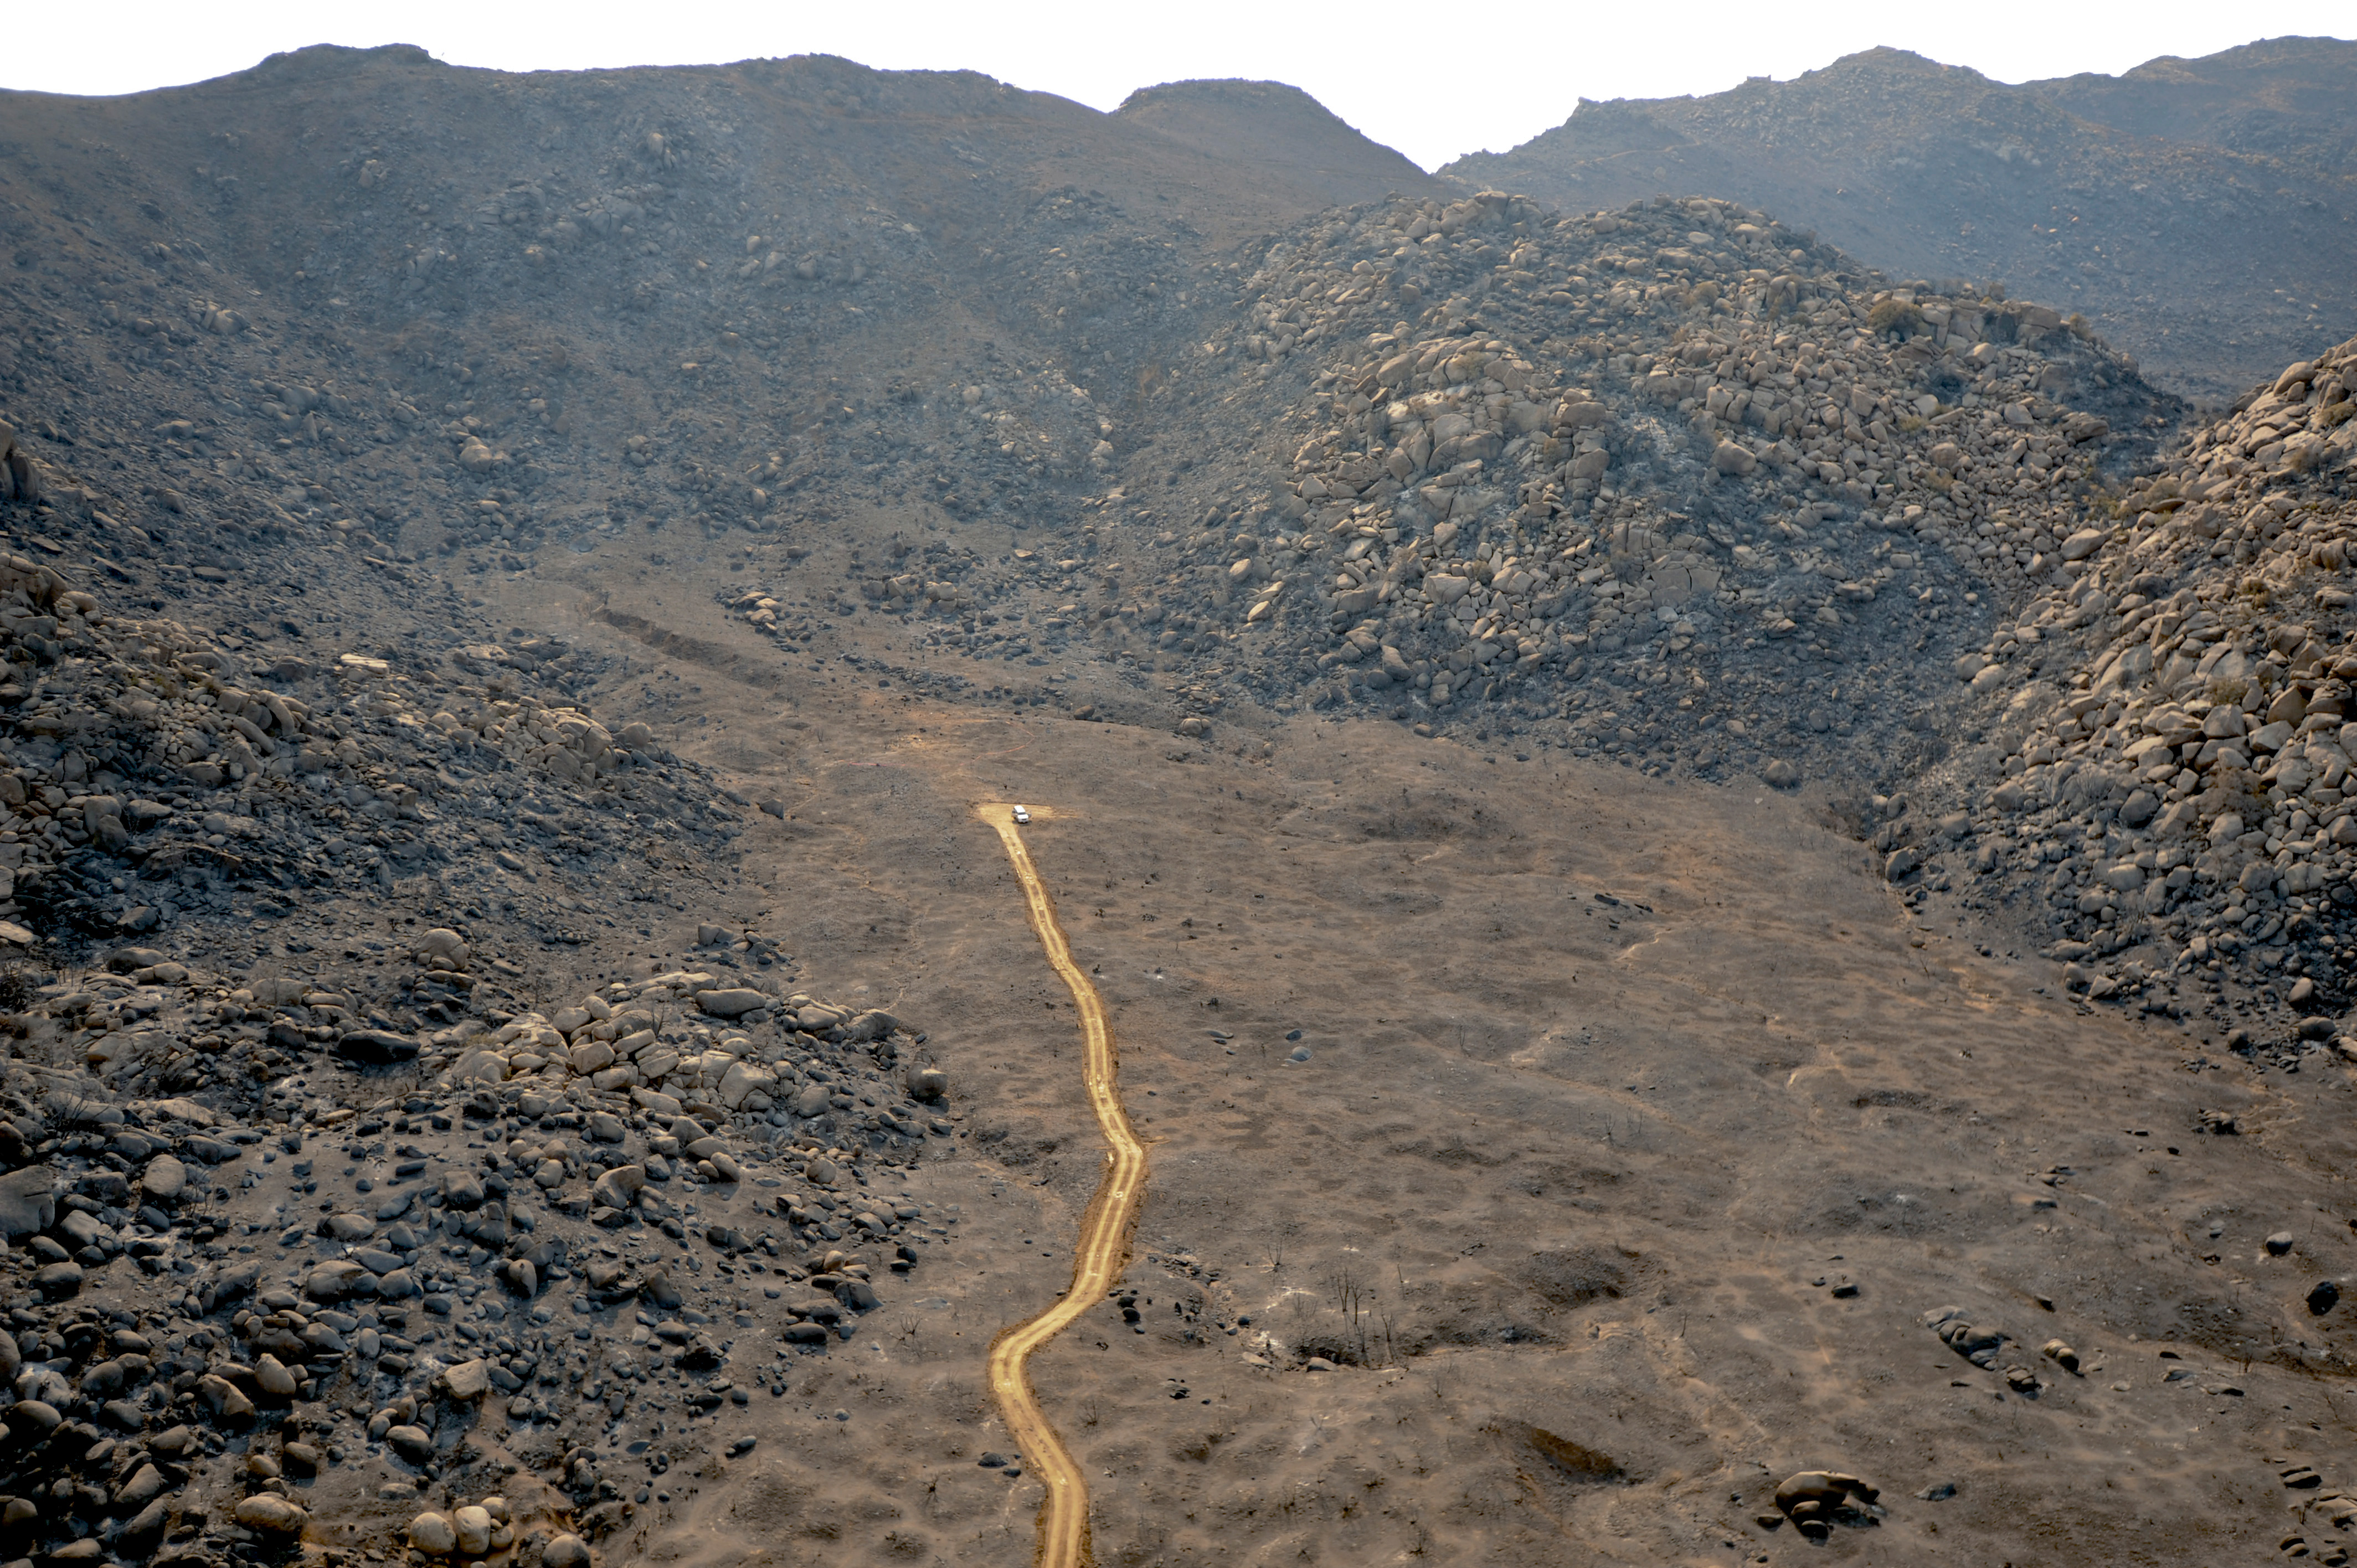 Arizona yavapai county yarnell - Remembering The Yarnell Hill Wildfire Tragedy Video The Daily Courier Prescott Az